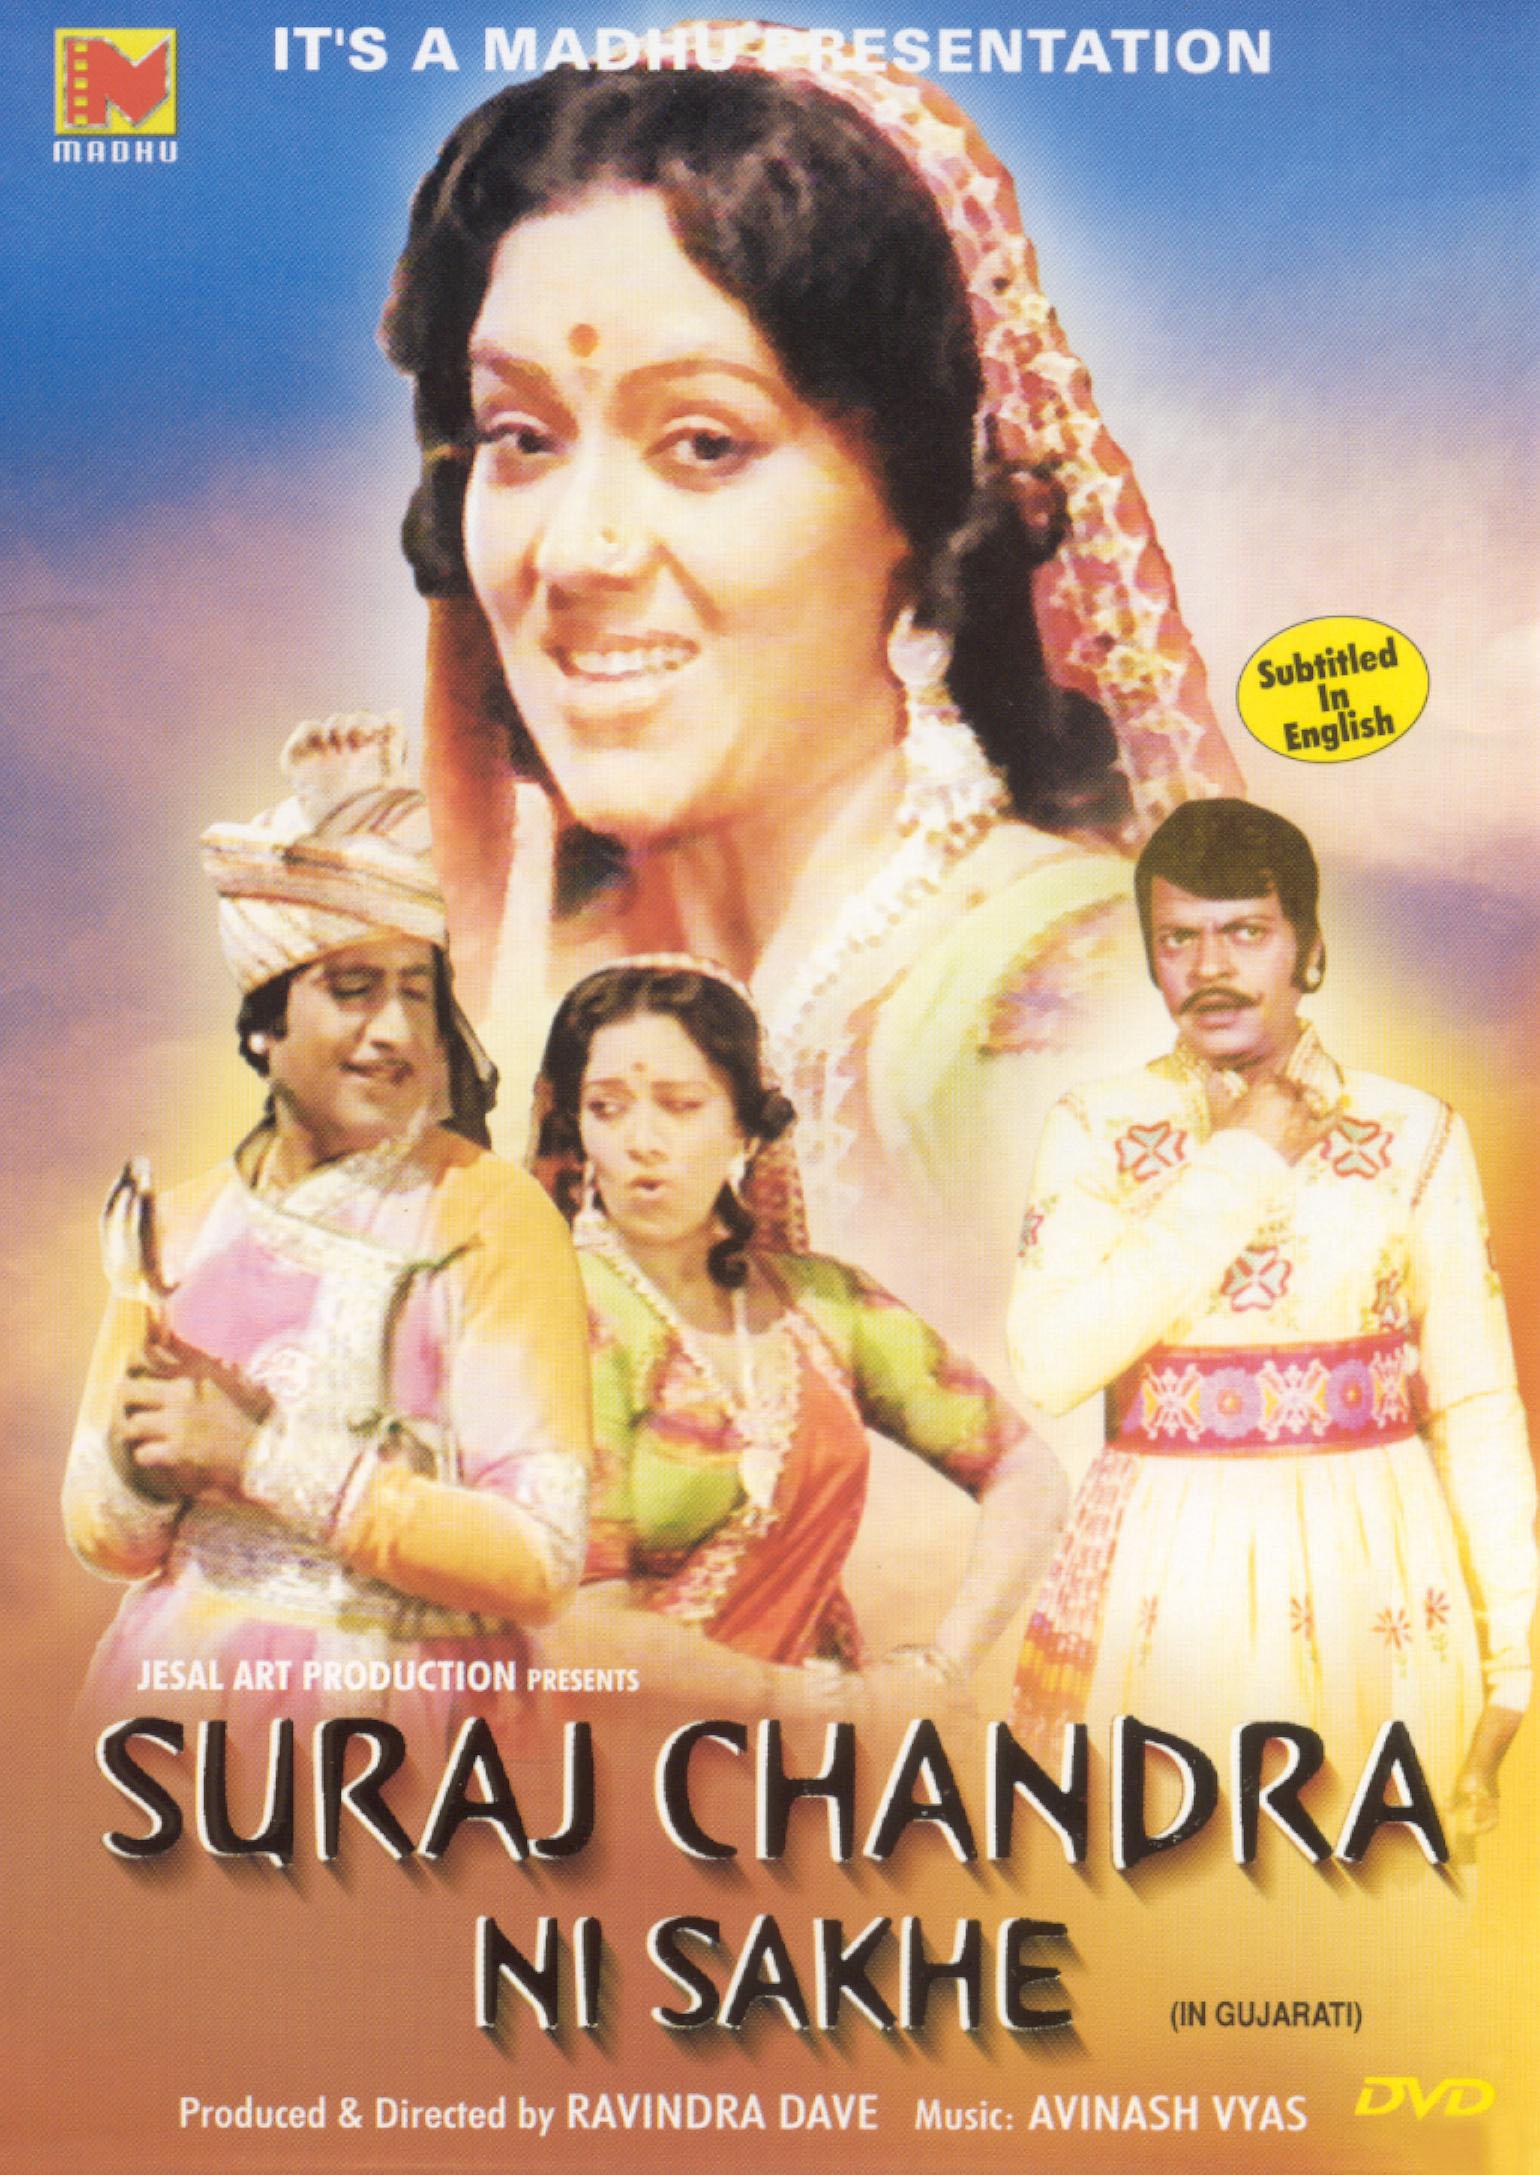 Suraj Chandra Ni Sakhe